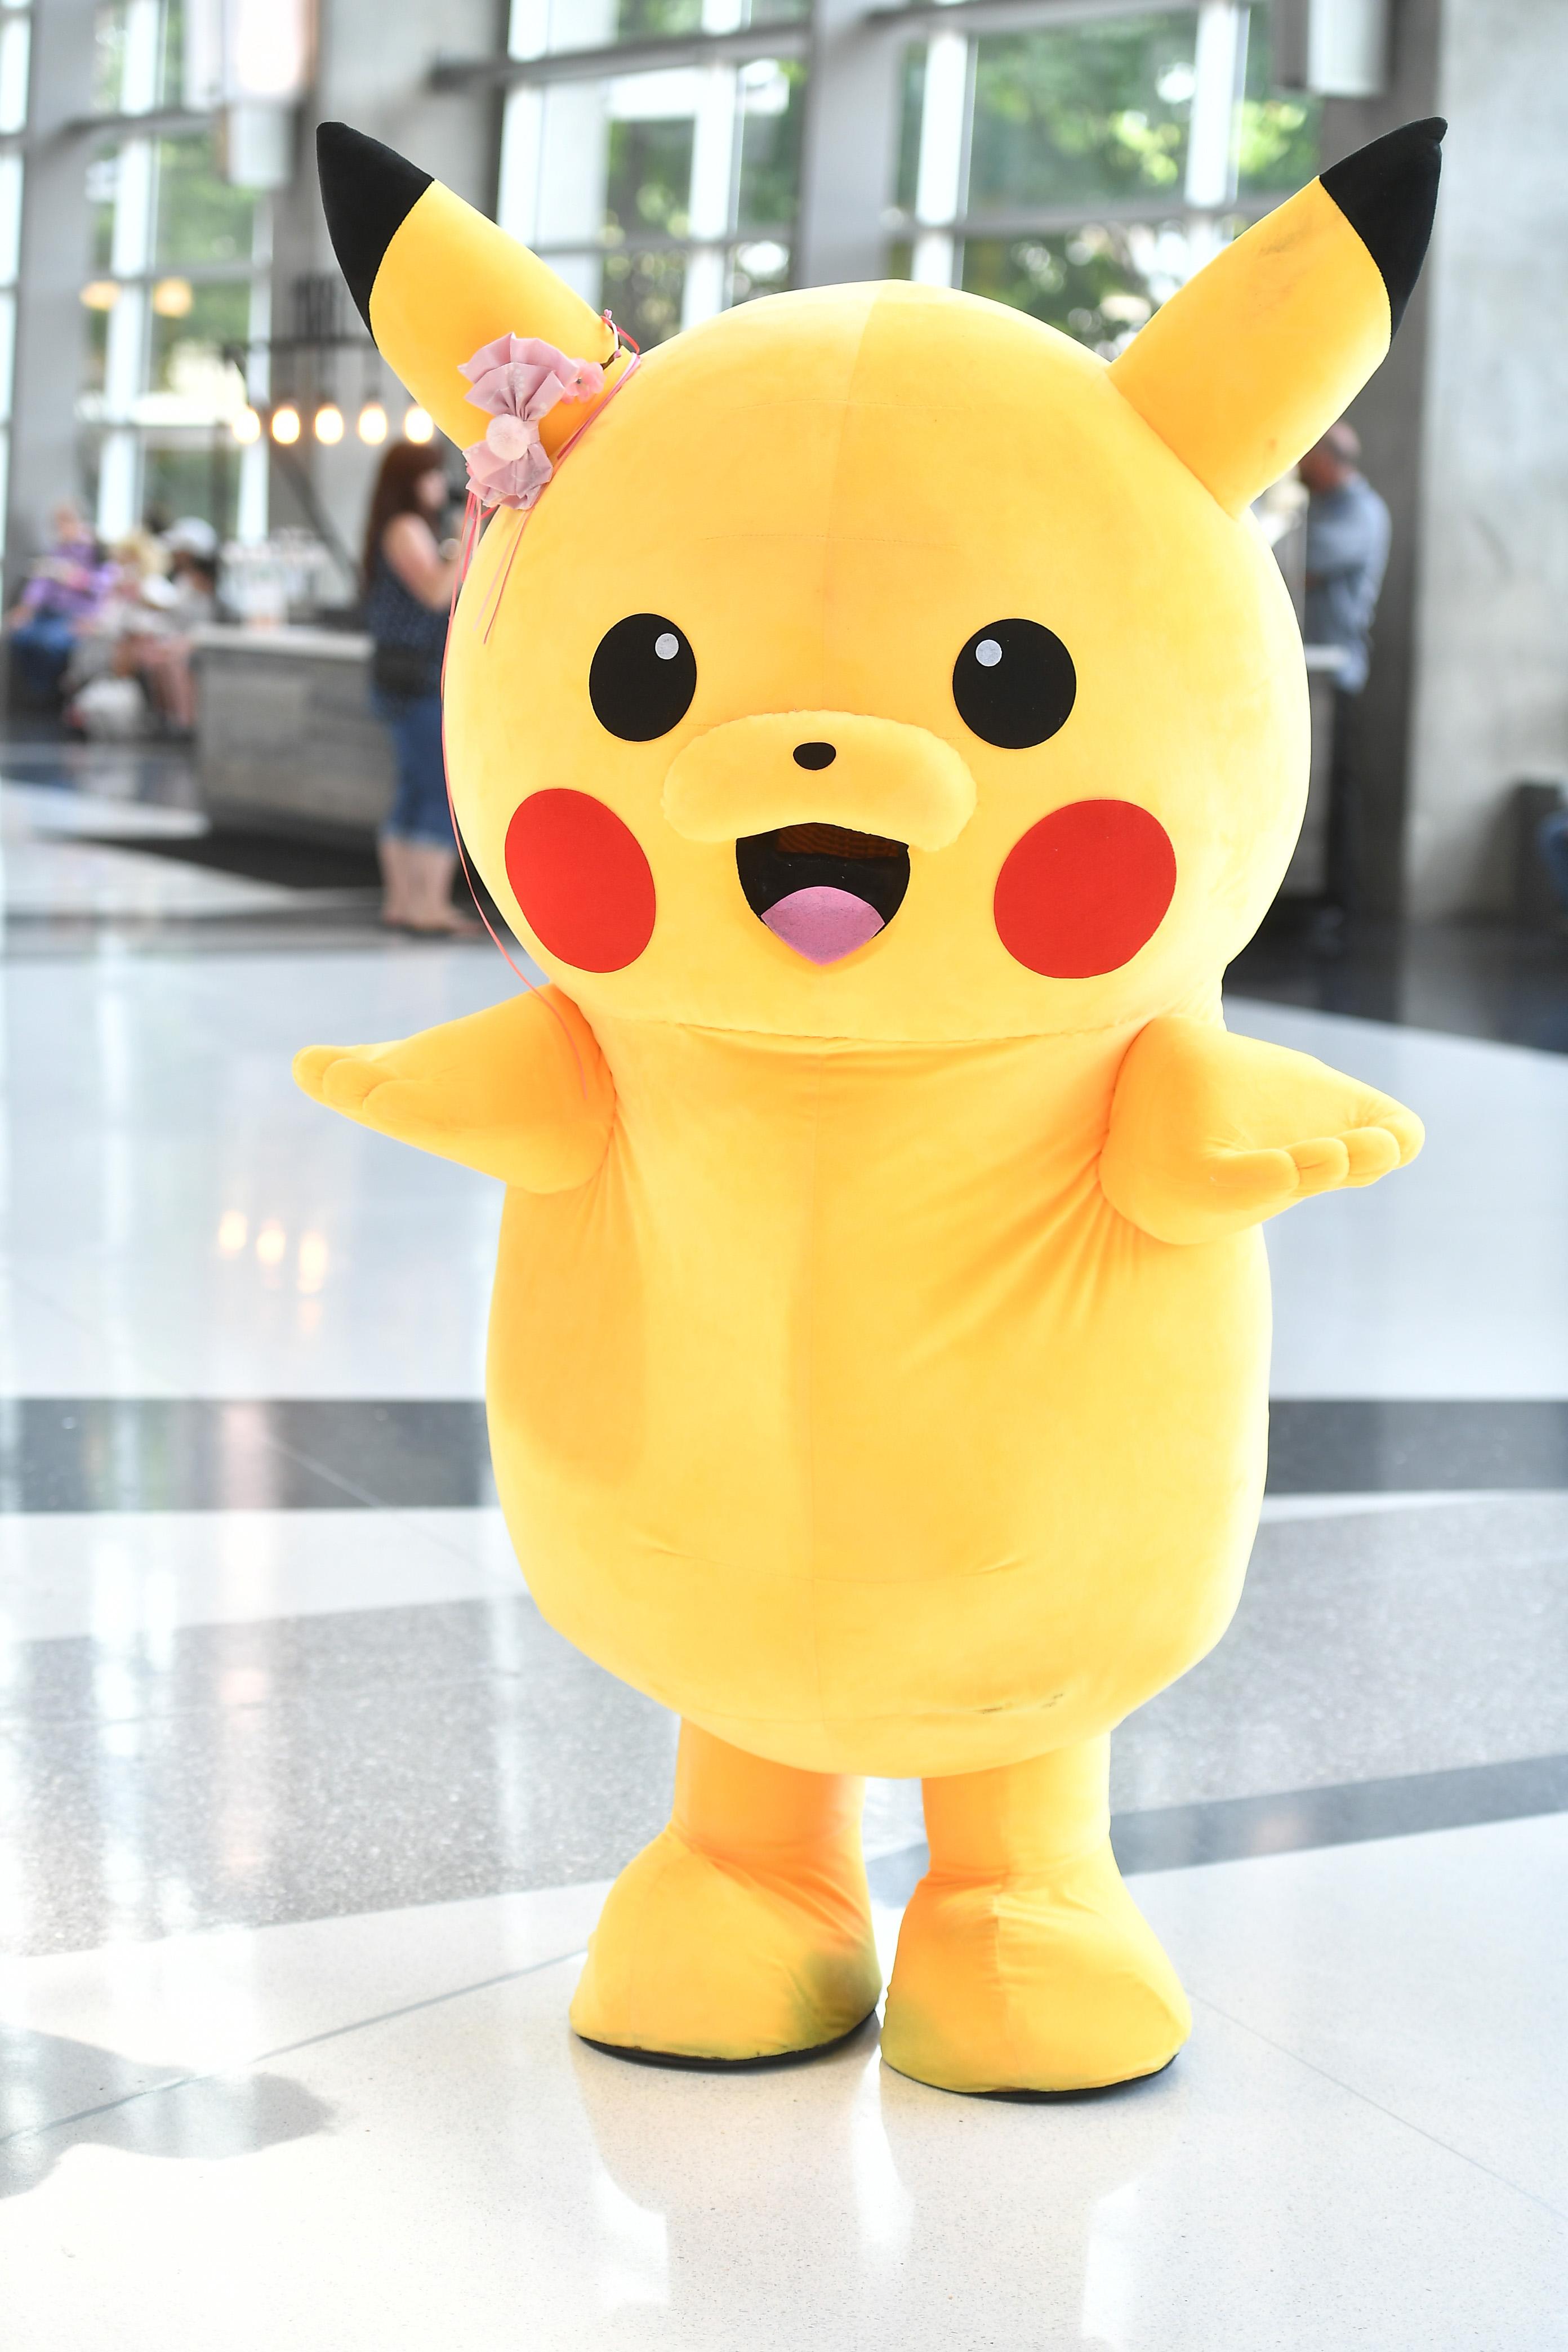 A life-sized Pikachu at the 2019 Atlanta Comic Con